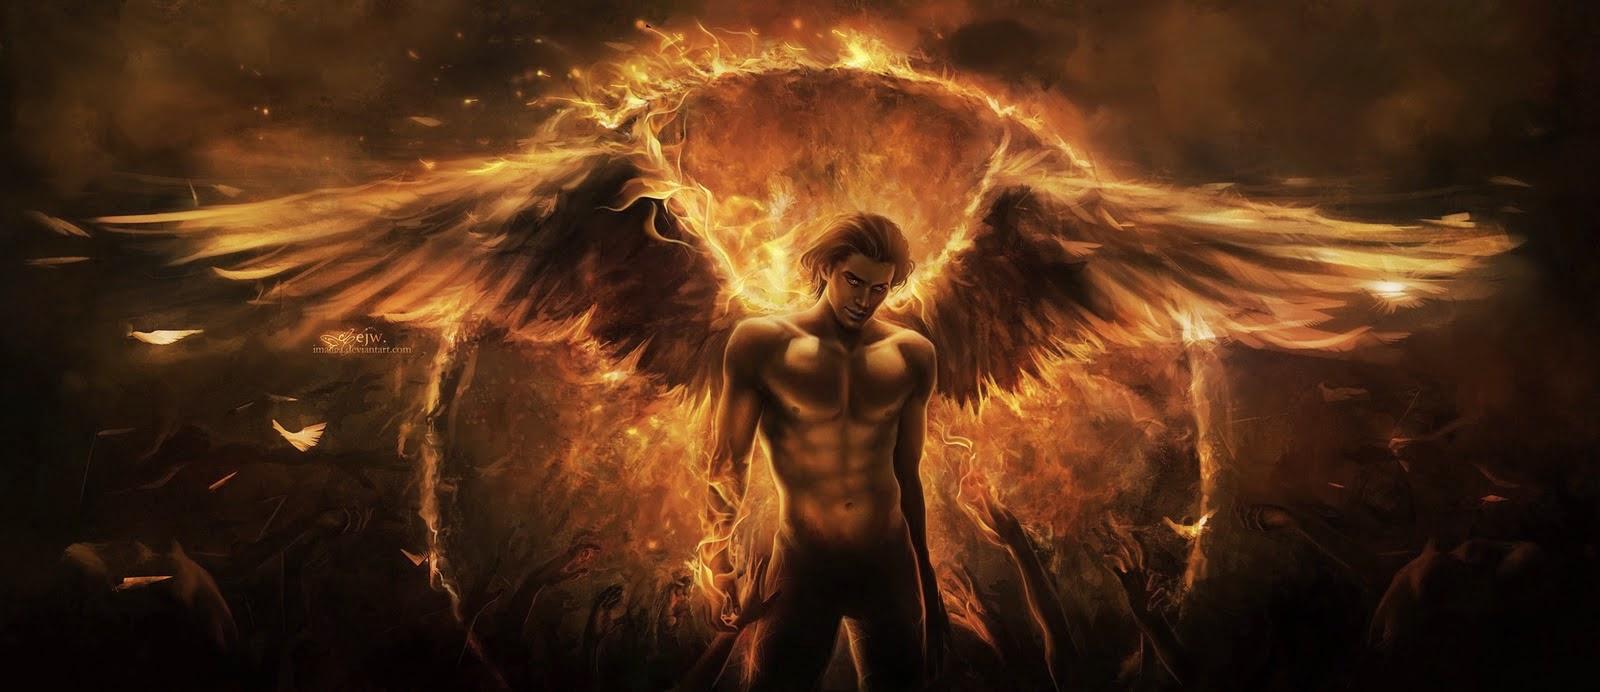 Fallen Angels Essay Prairiemary  The Outsiders Essay Pixels  Fallen Angels Essay